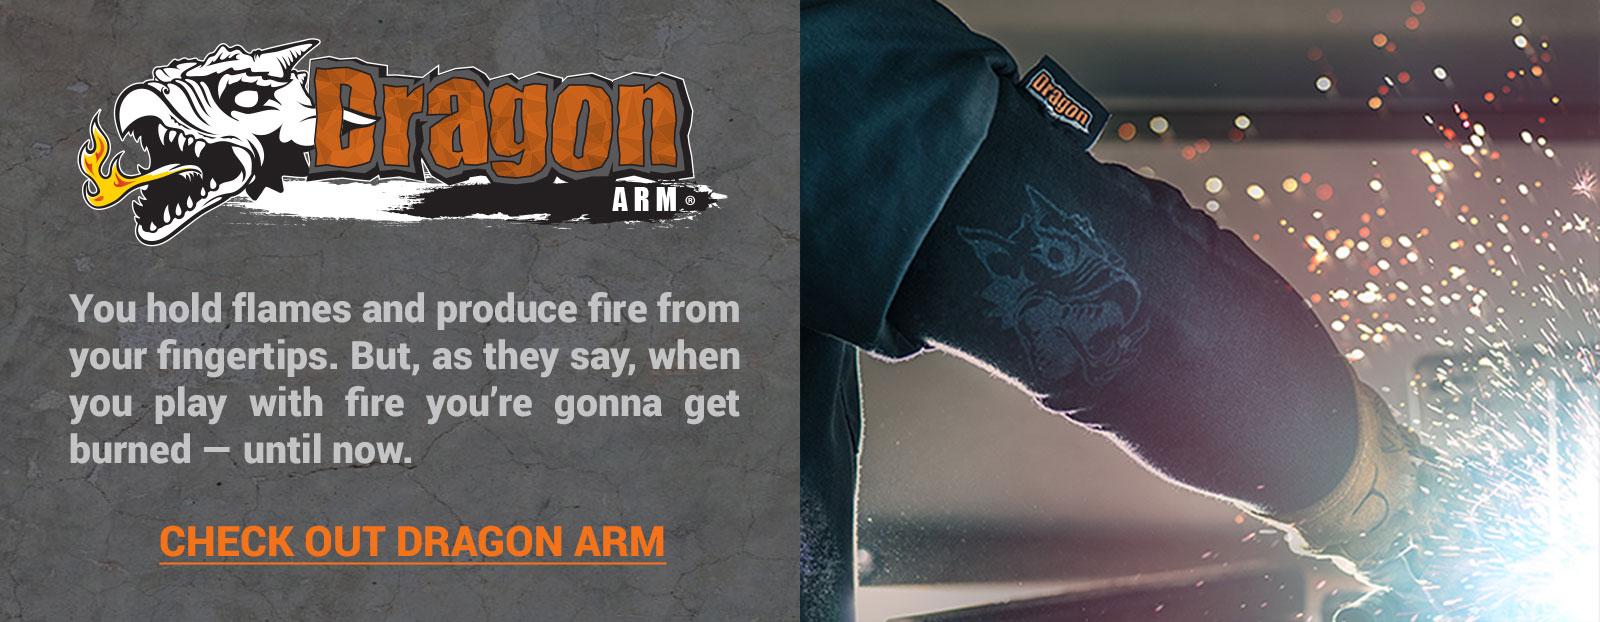 Dragon Arm